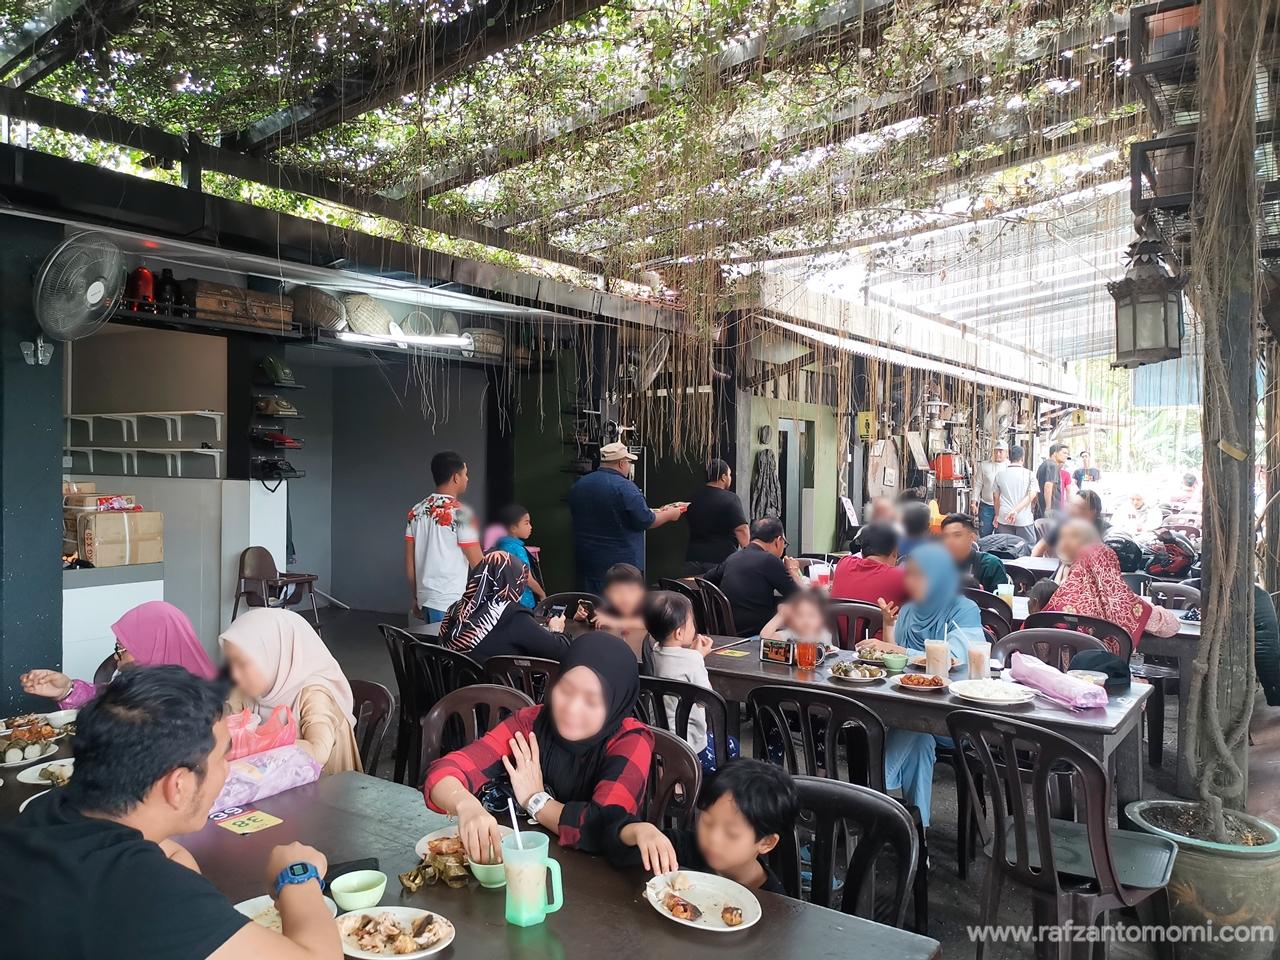 Cuba Makan Lemang To'ki, Bentong